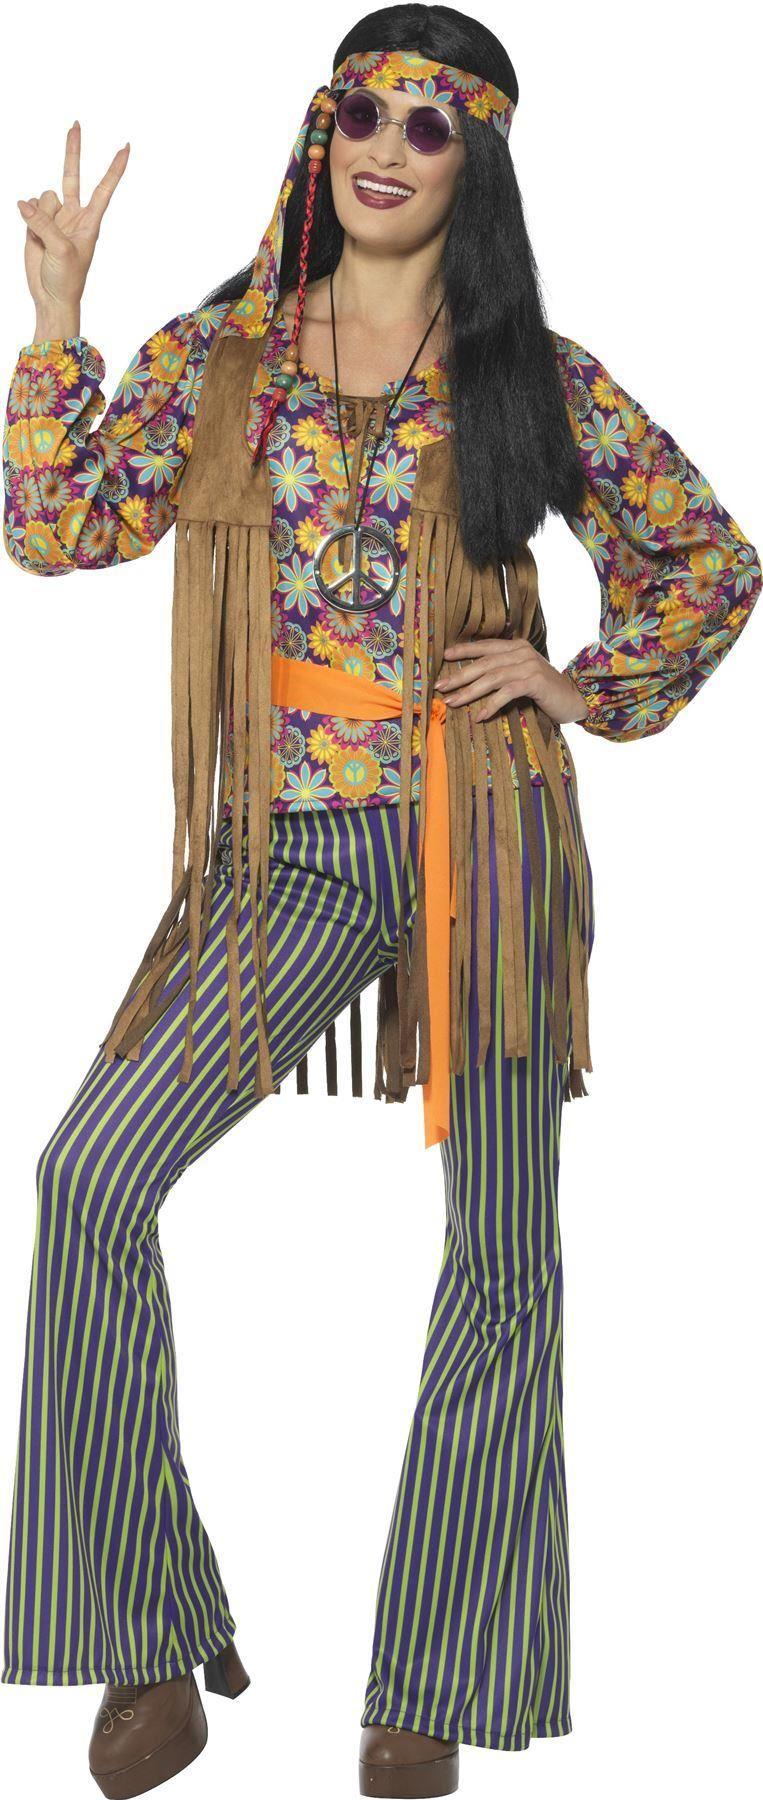 Adults-60s-70s-Hippie-Costume-Mens-Ladies-Hippy-  sc 1 st  eBay & Adults 60s 70s Hippie Costume Mens Ladies Hippy Fancy Dress Womens ...